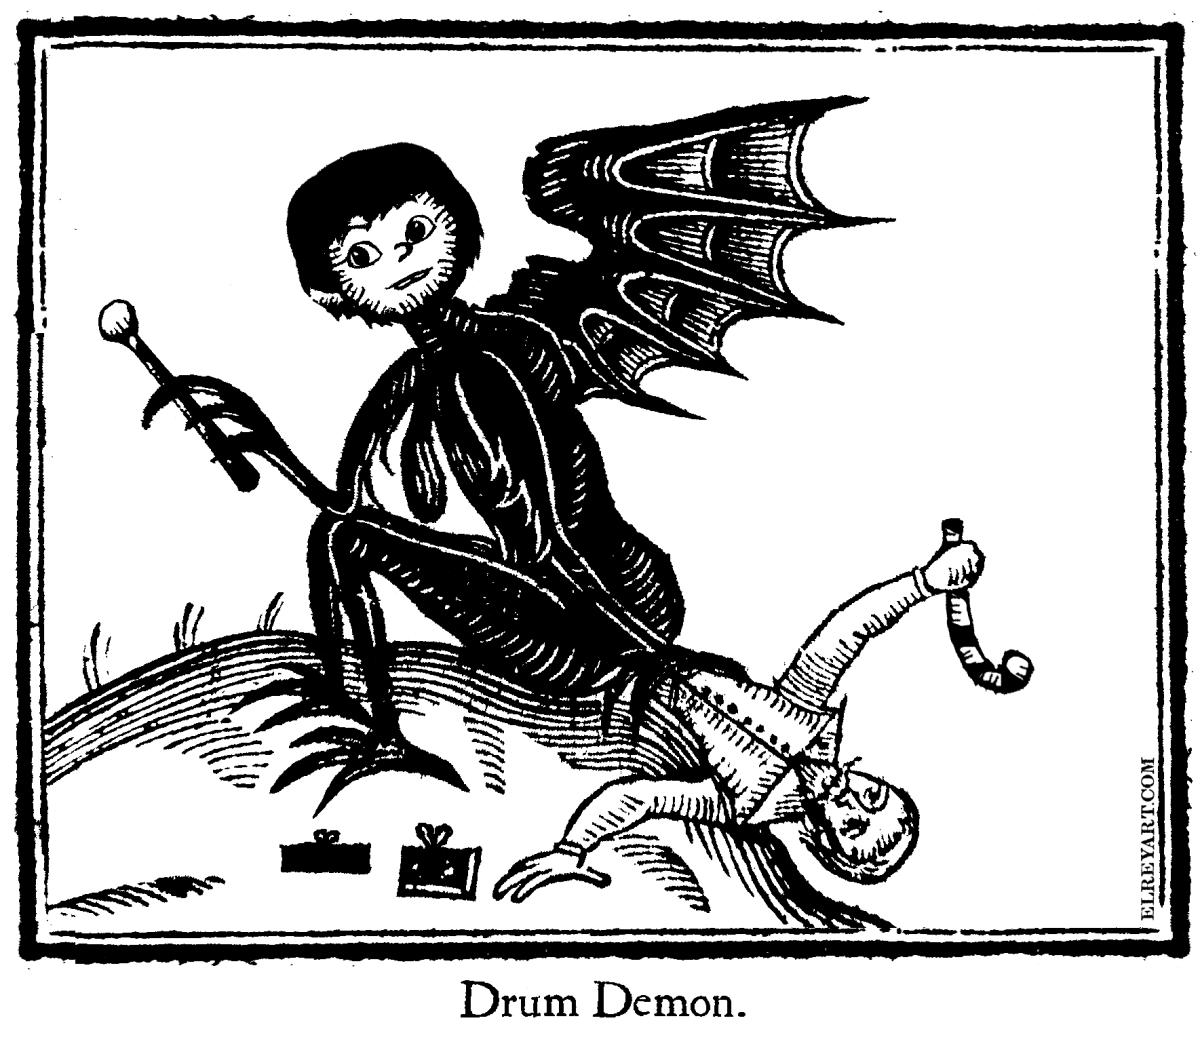 Little Drummer Boy Demon Woodcut